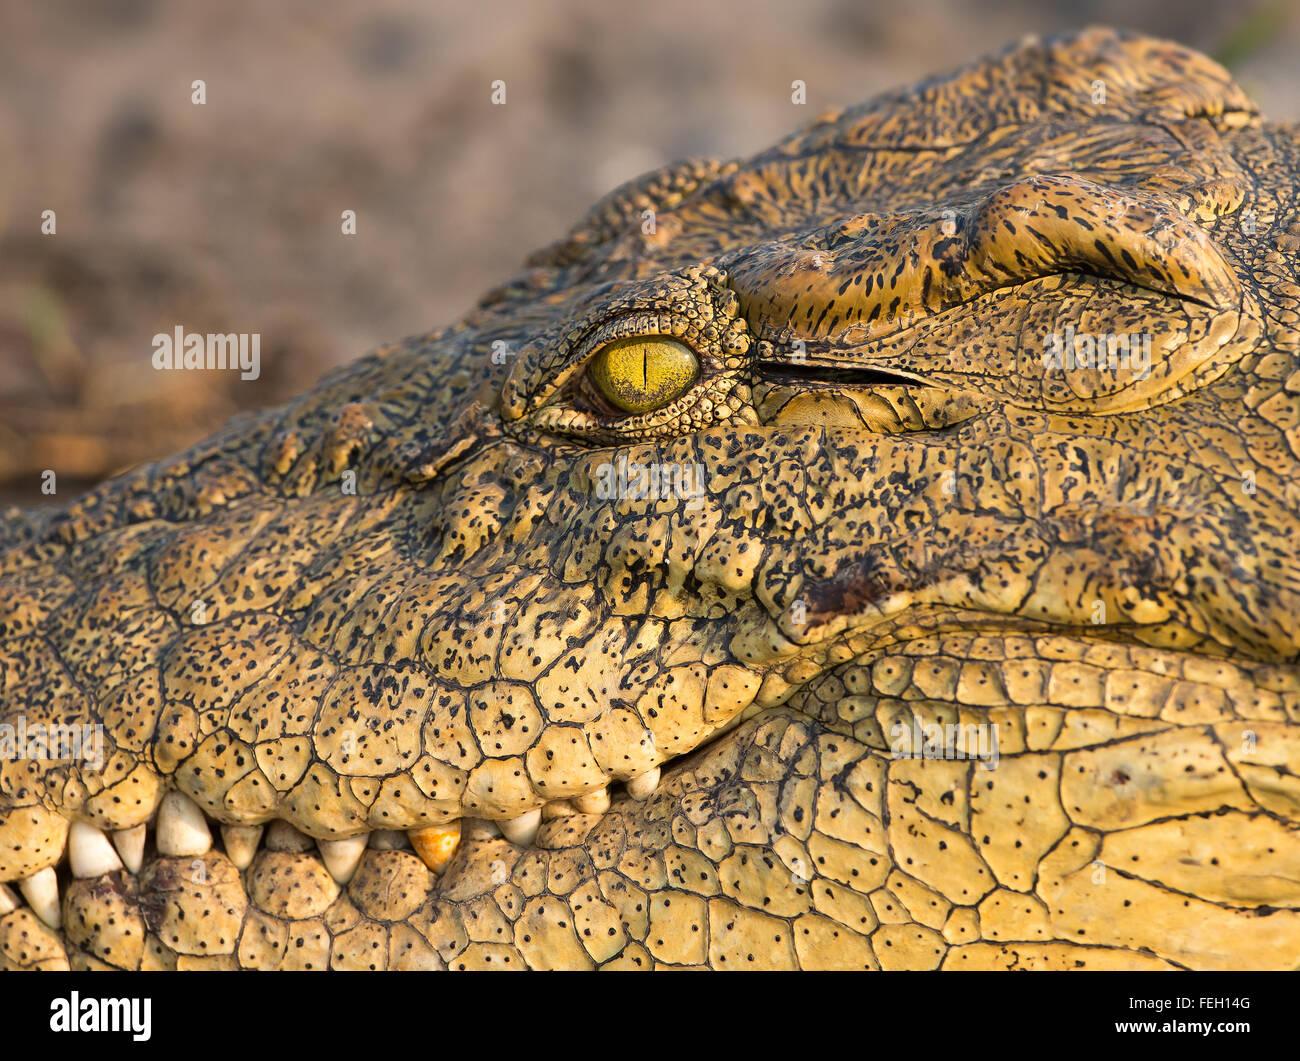 Fearsome looking Crocodile closeup side photo of eye and teeth in Chobe river Botswana - Stock Image